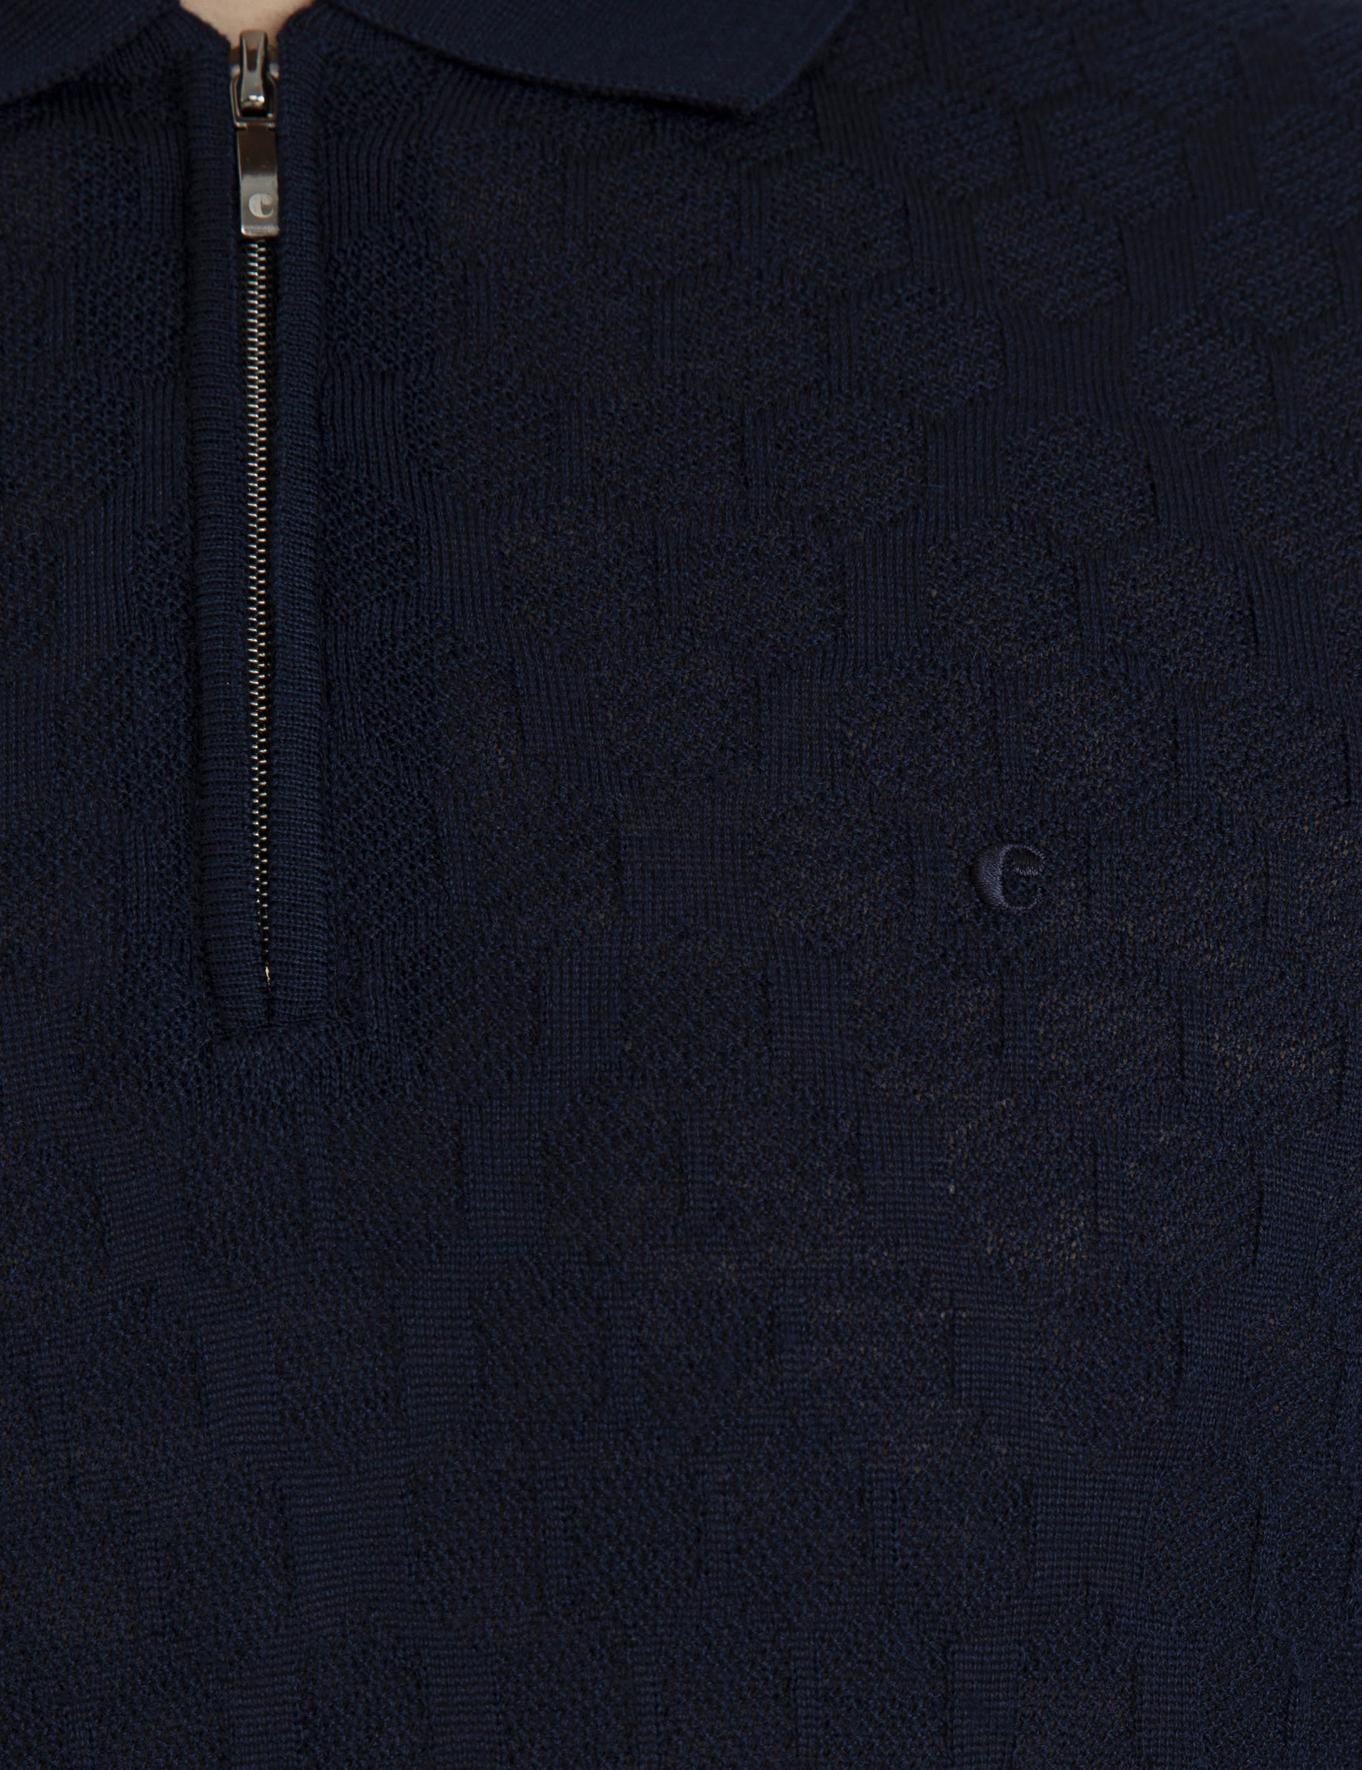 Polo Yaka Kazak - 50230066037